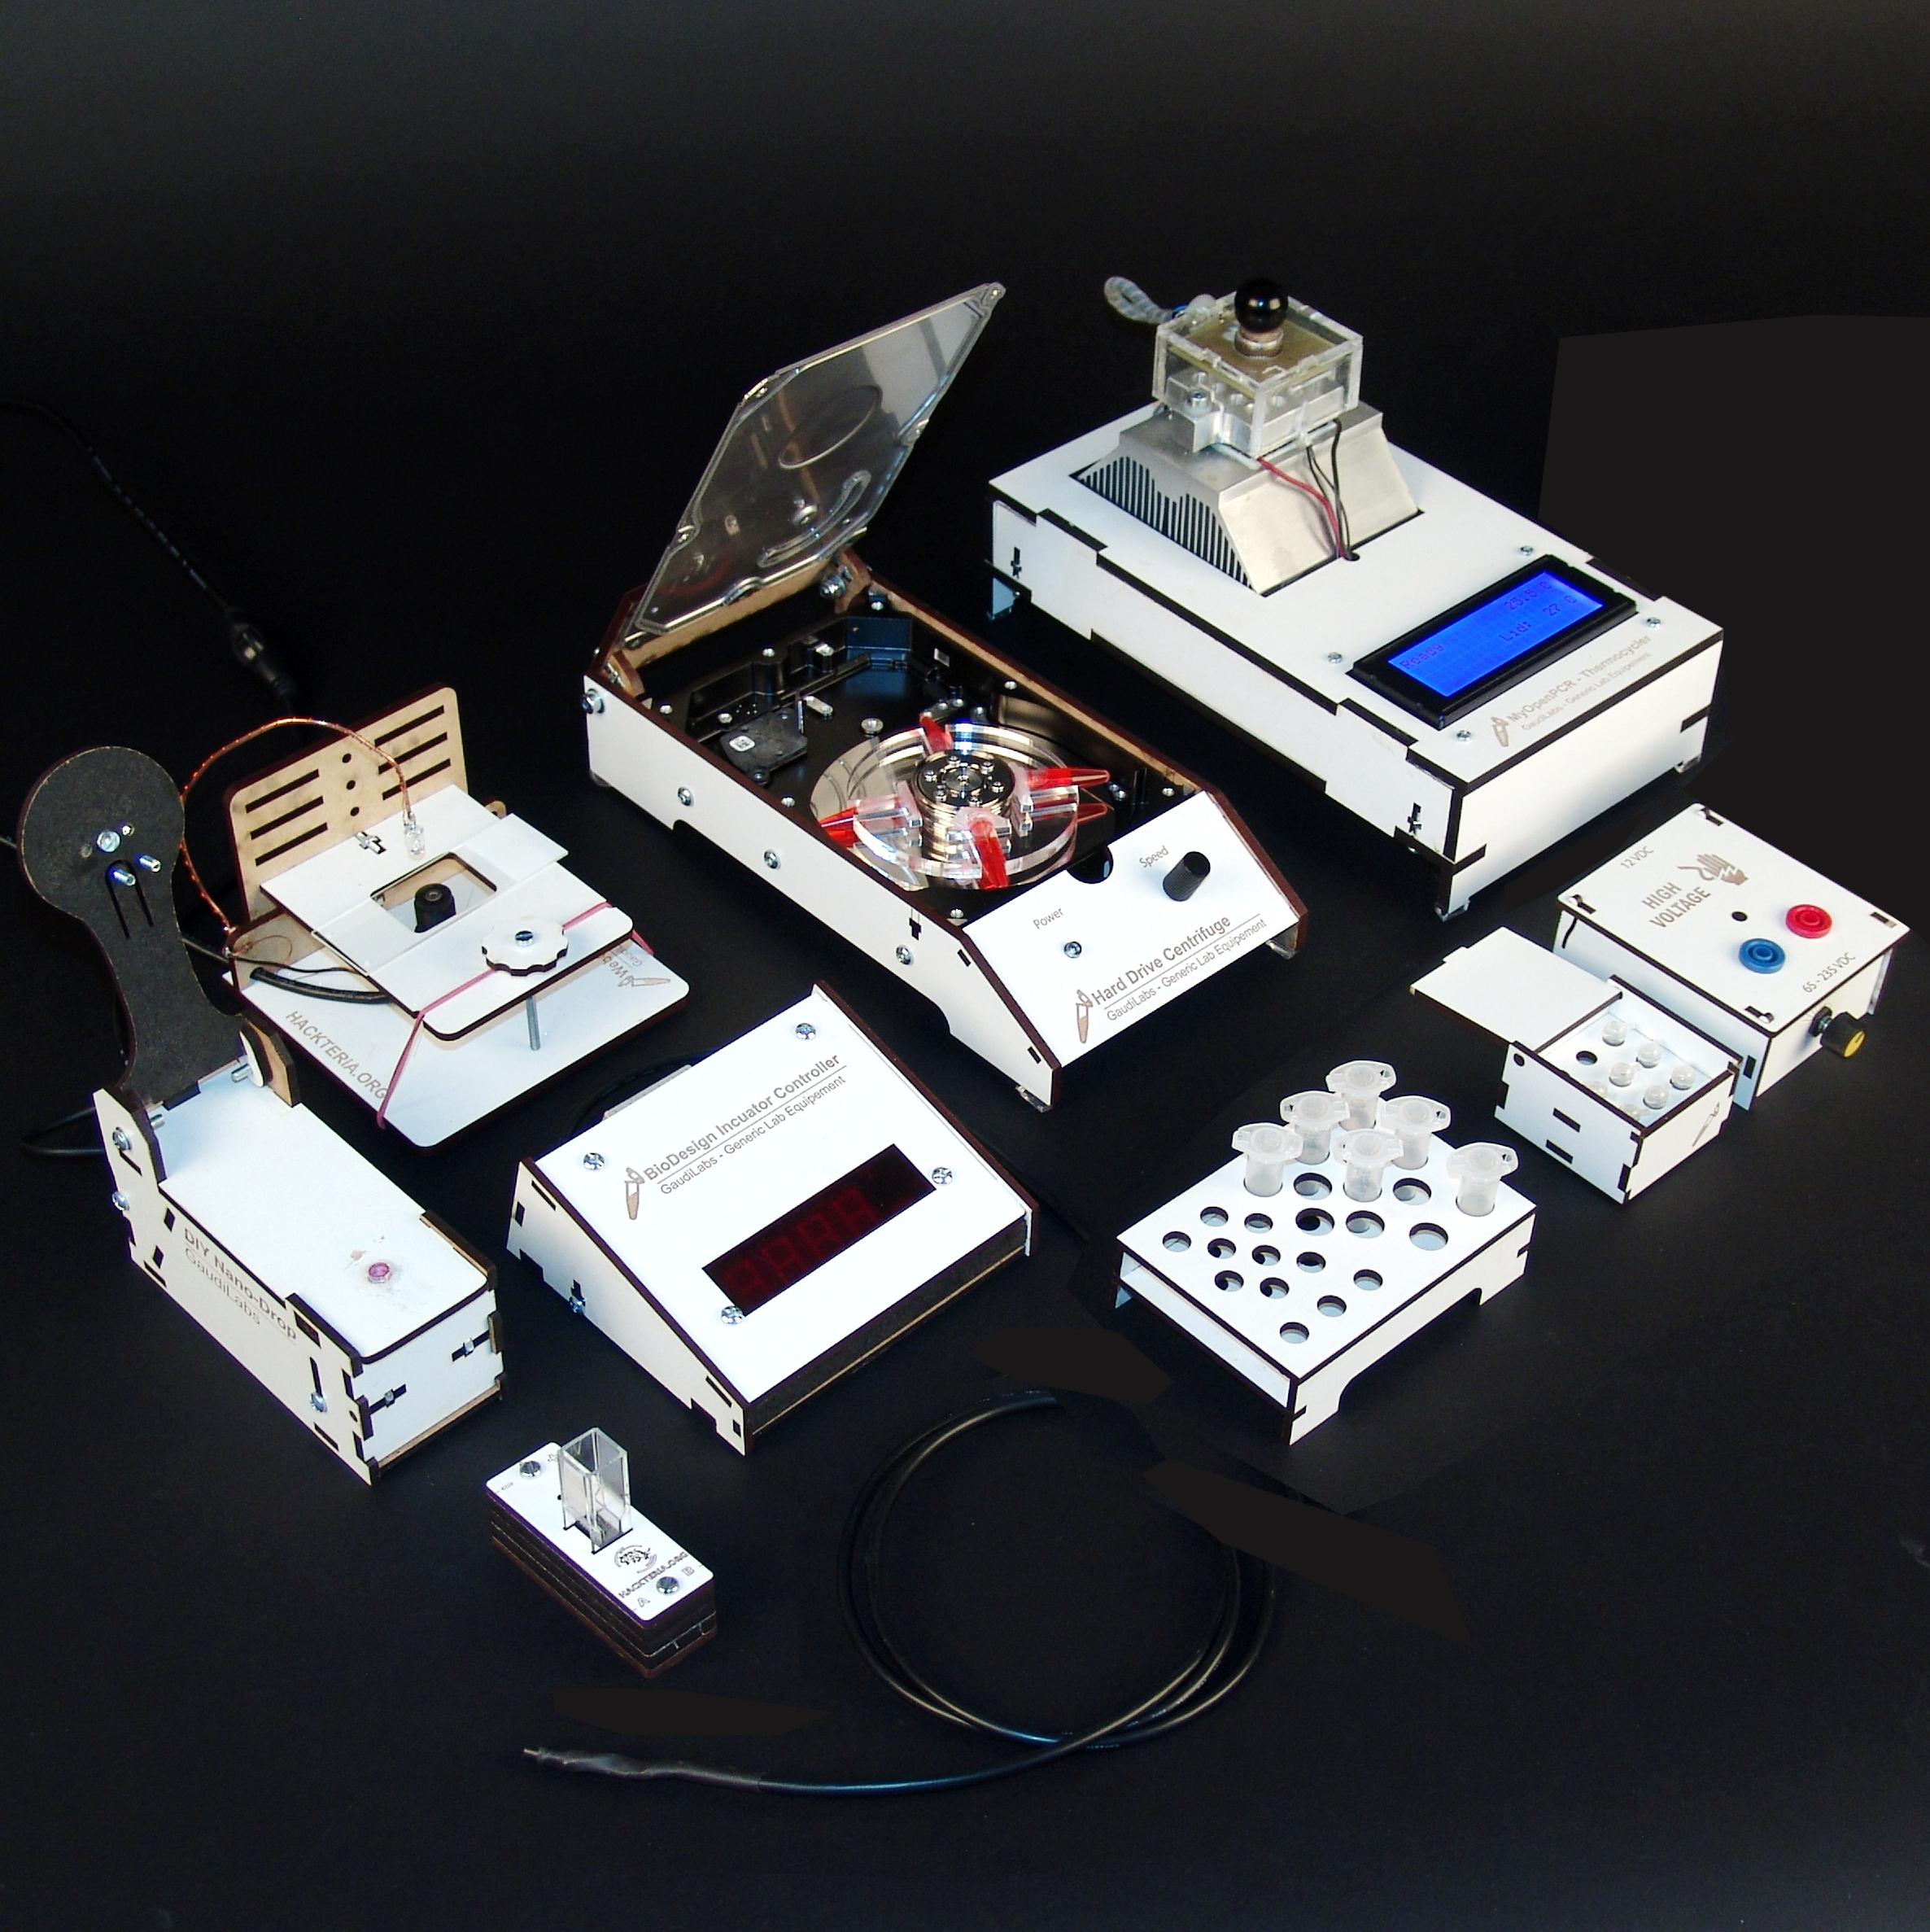 Generic Lab Equipment by GaudiLabs